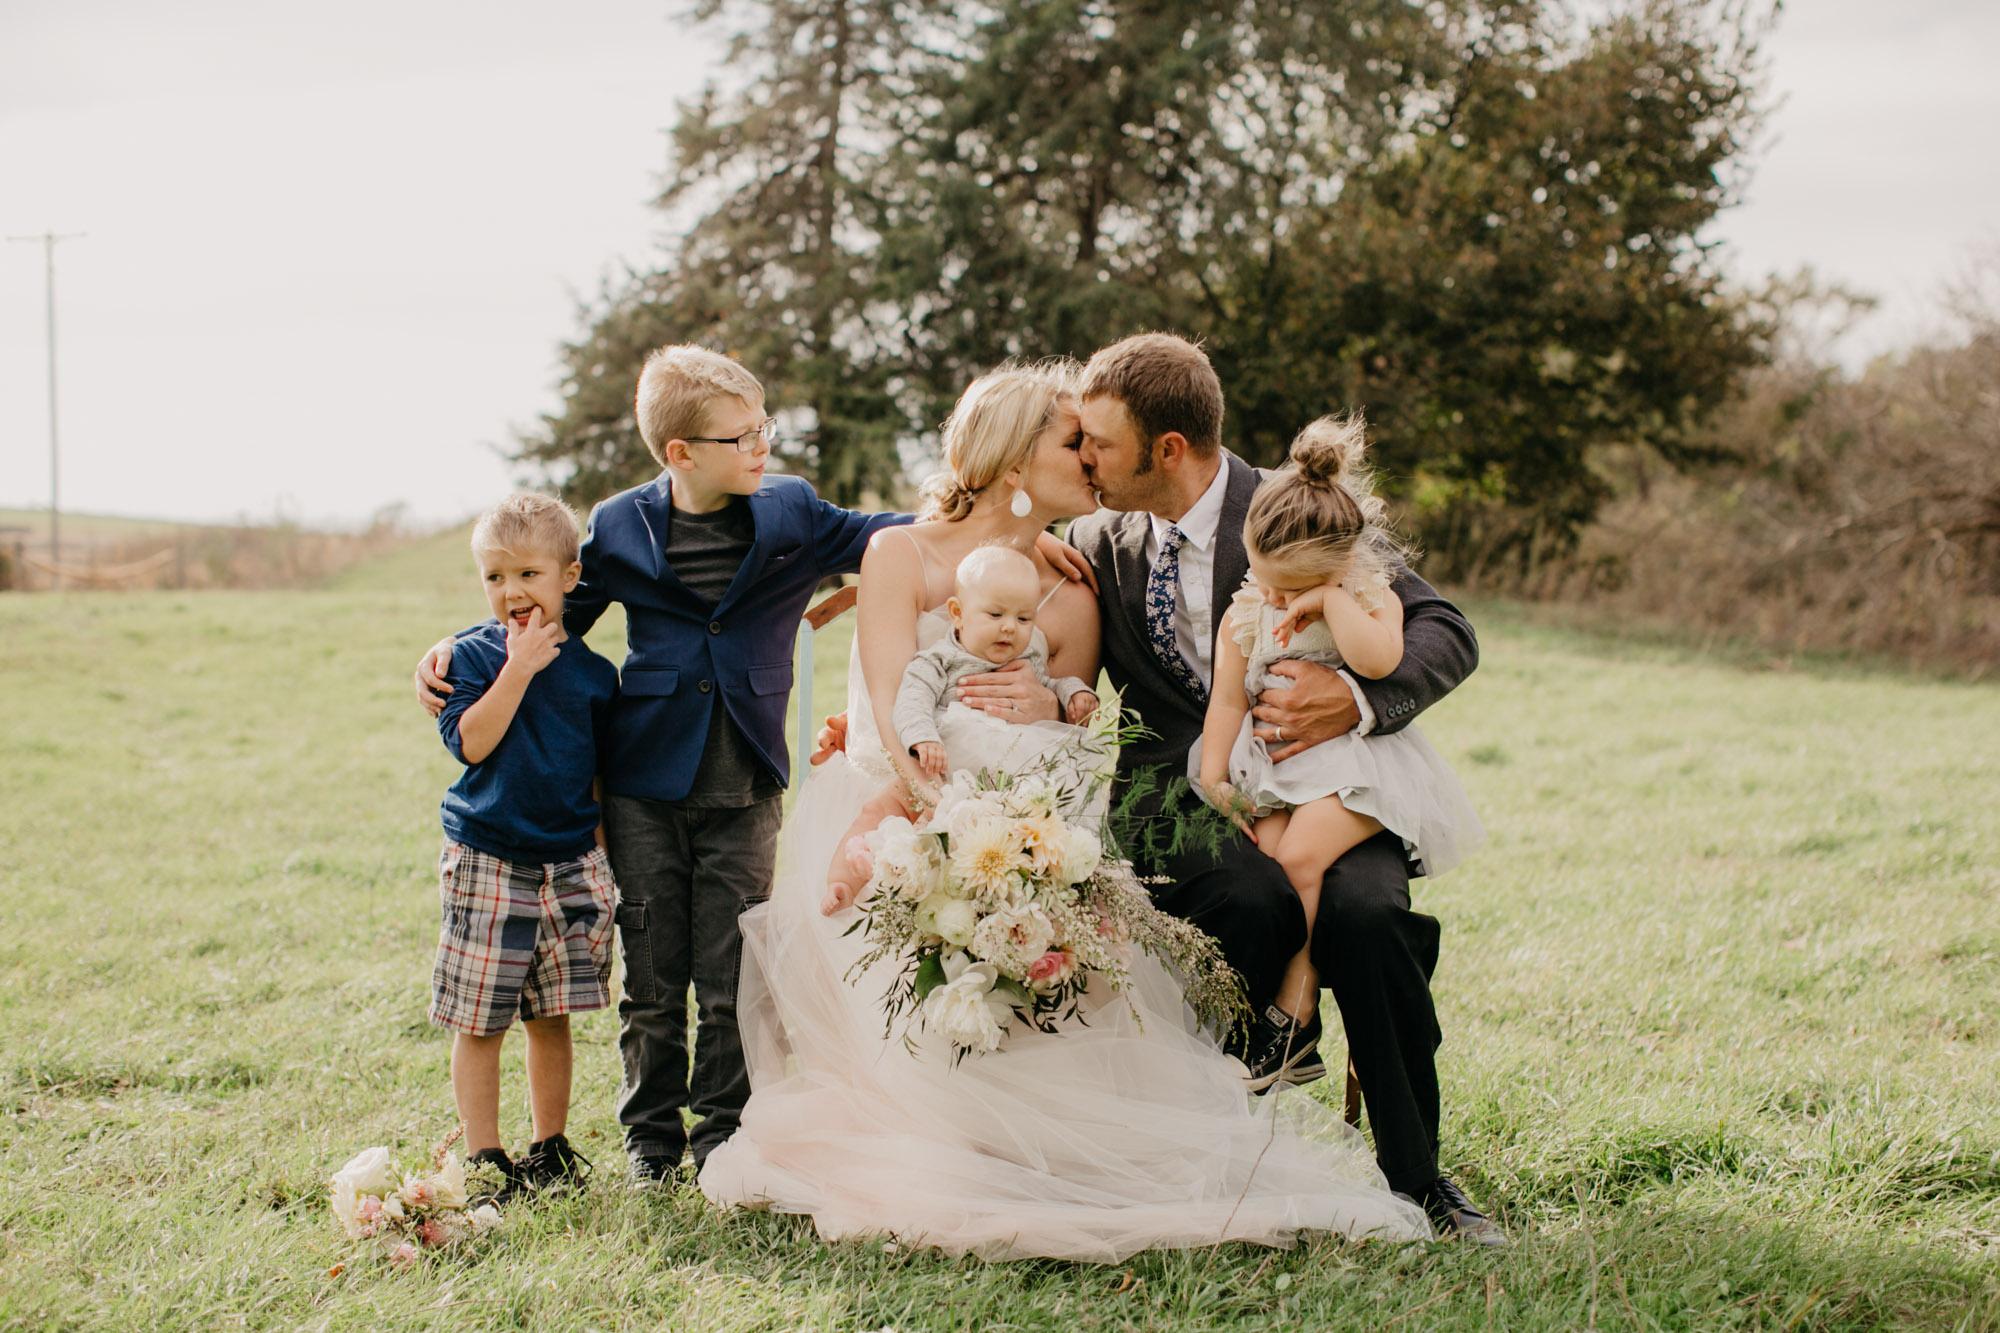 omaha-wedding-photographer-meghan-time-23.jpg